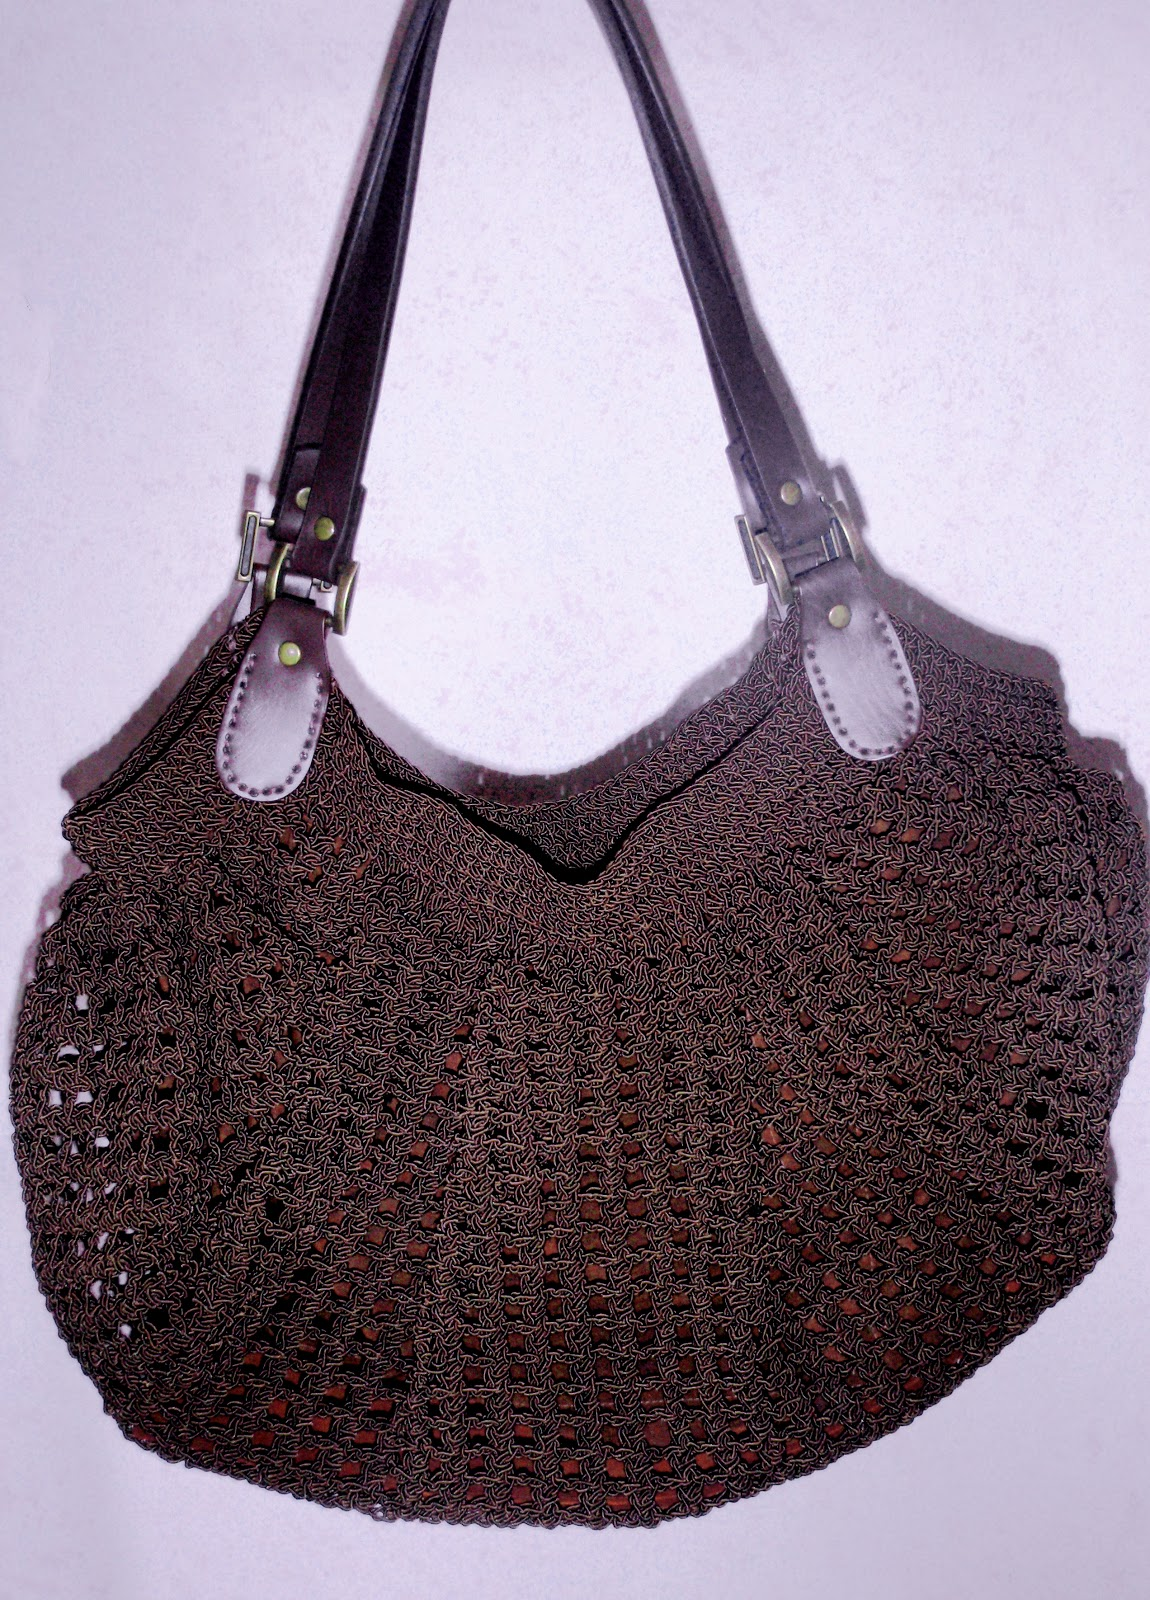 Crochet Bag Bottom : In My Silence.... Fat Bottom Crochet Bag Again Bag n Craft